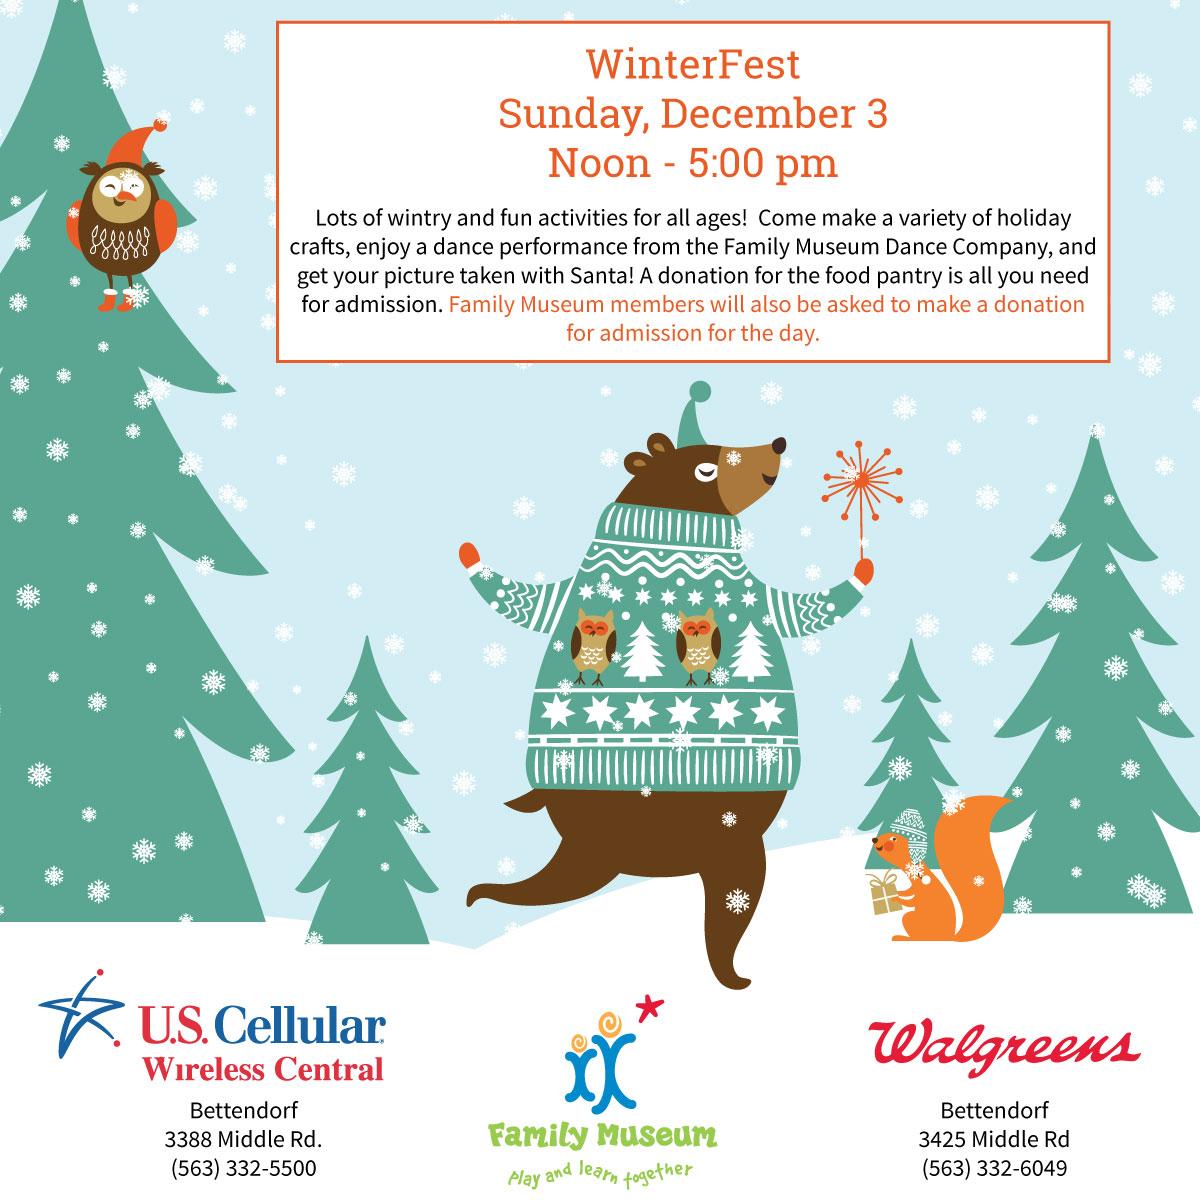 events - Walgreens Christmas Day